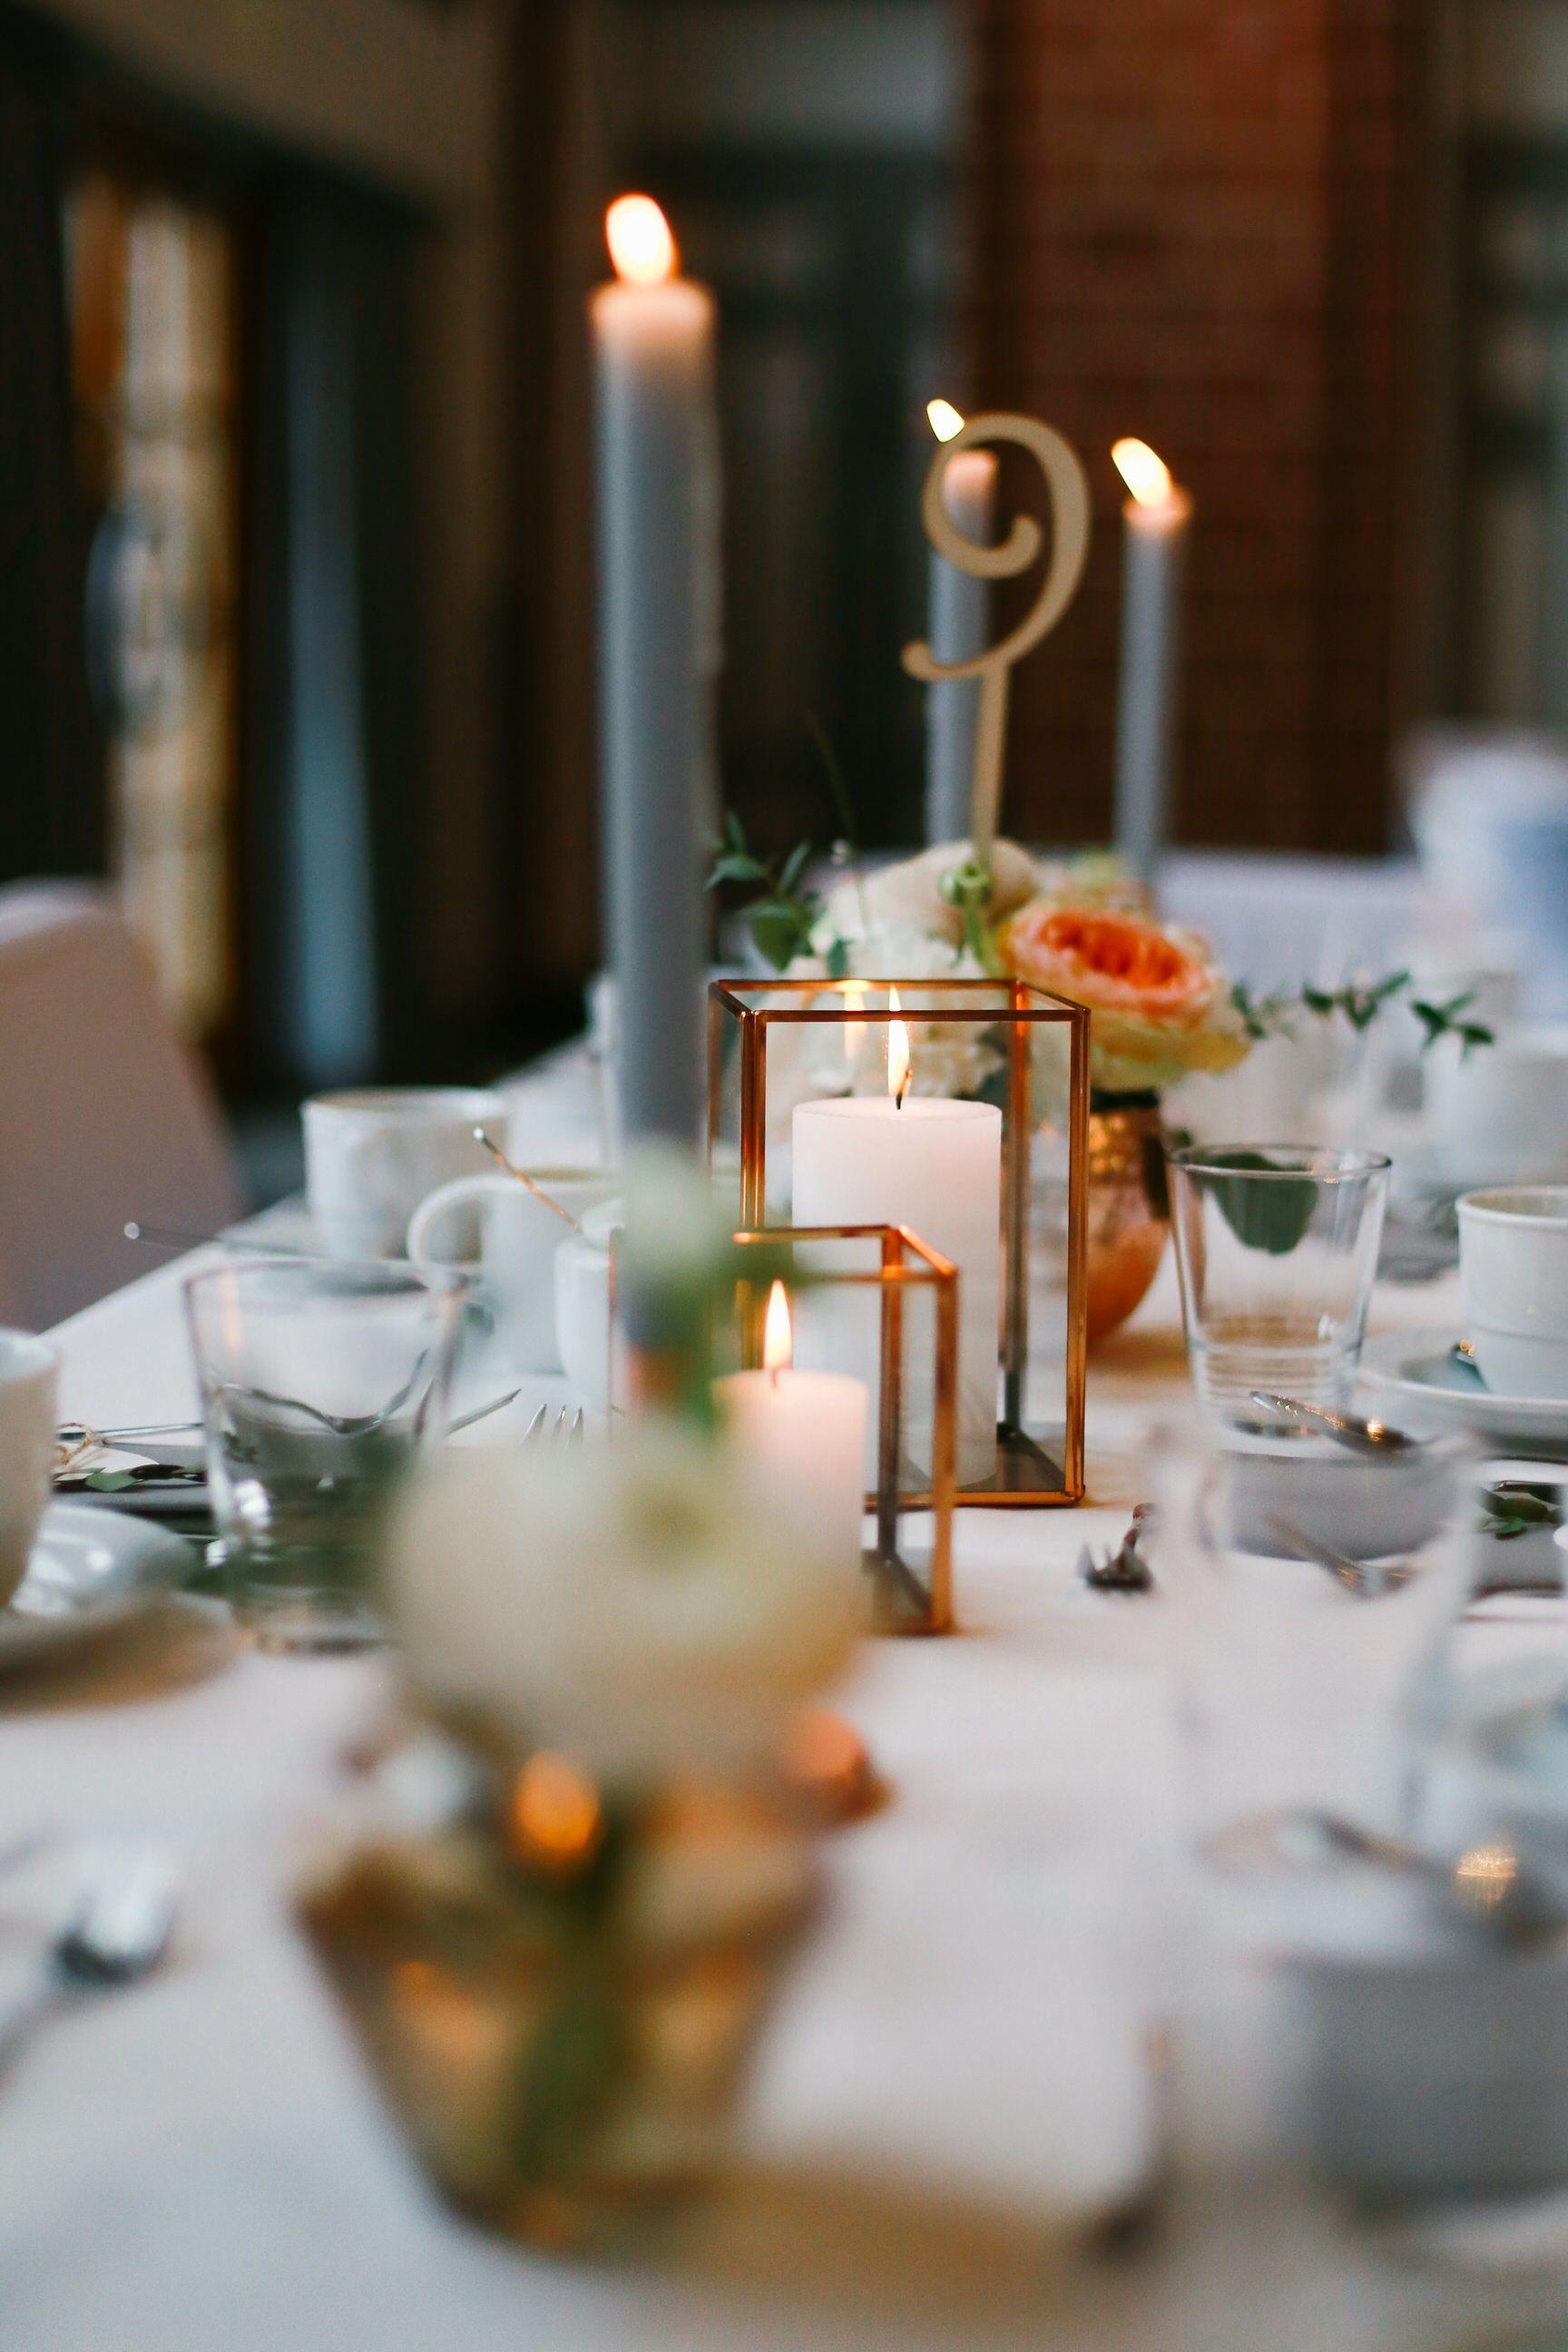 dekoration tischdeko kupfer rustikal hochzeit blumen kerzen eukalyptus copper. Black Bedroom Furniture Sets. Home Design Ideas